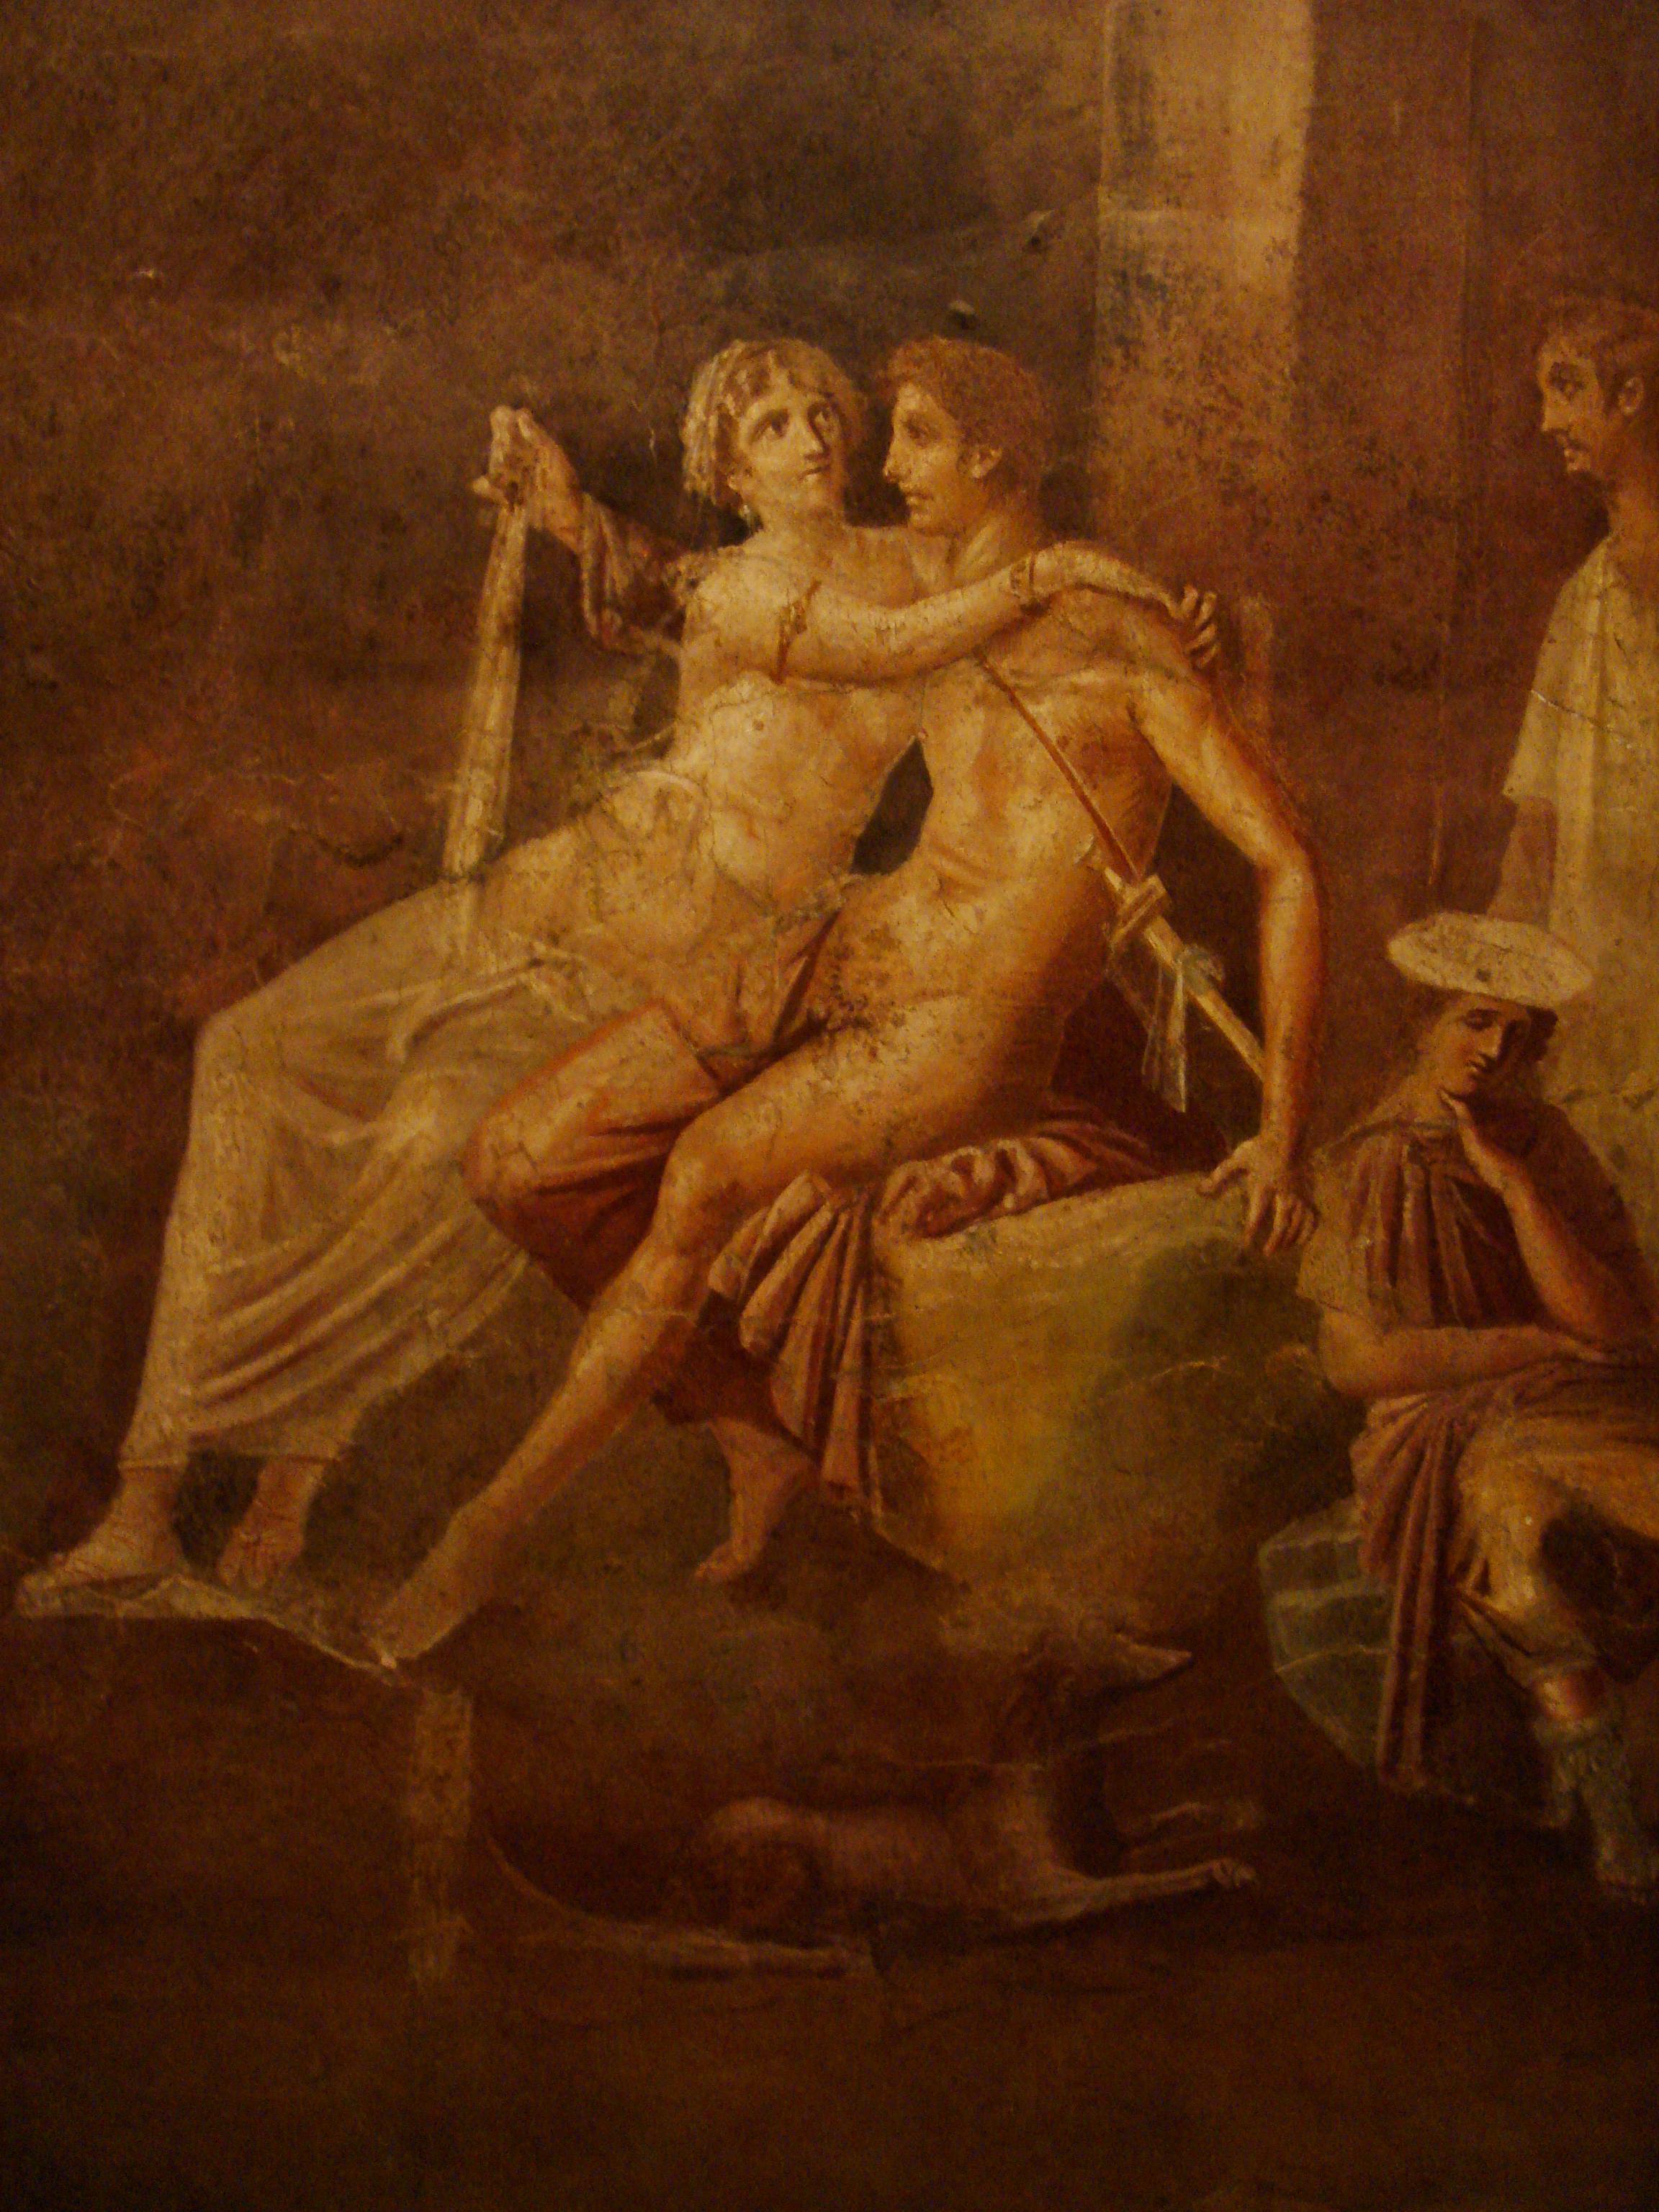 aeneas and creusa relationship trust